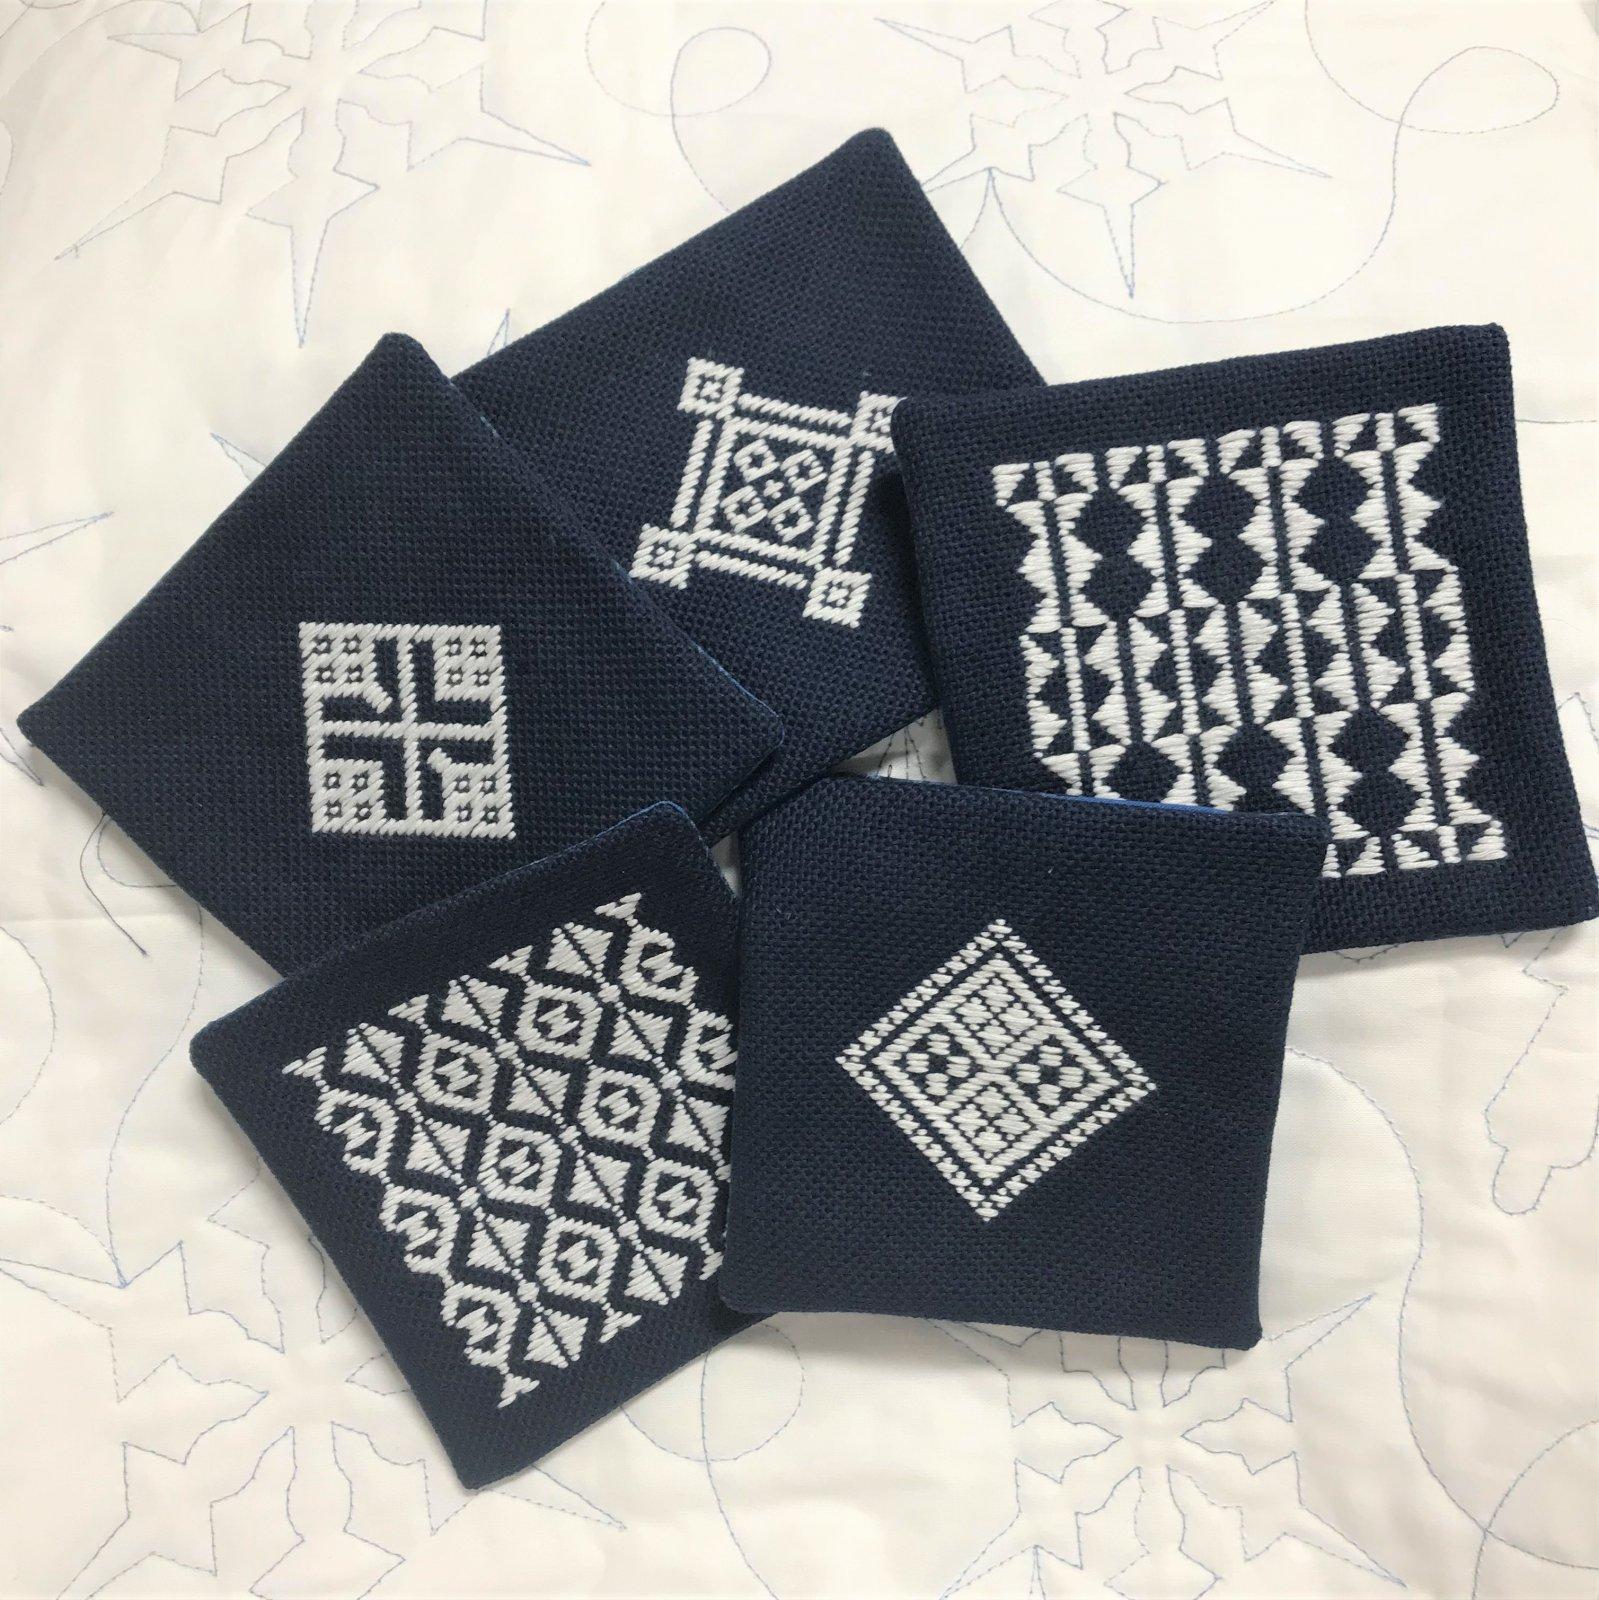 Olympus Kit Kogin 5 Mug Rugs or Coasters in White on Indigo SK-KGN013